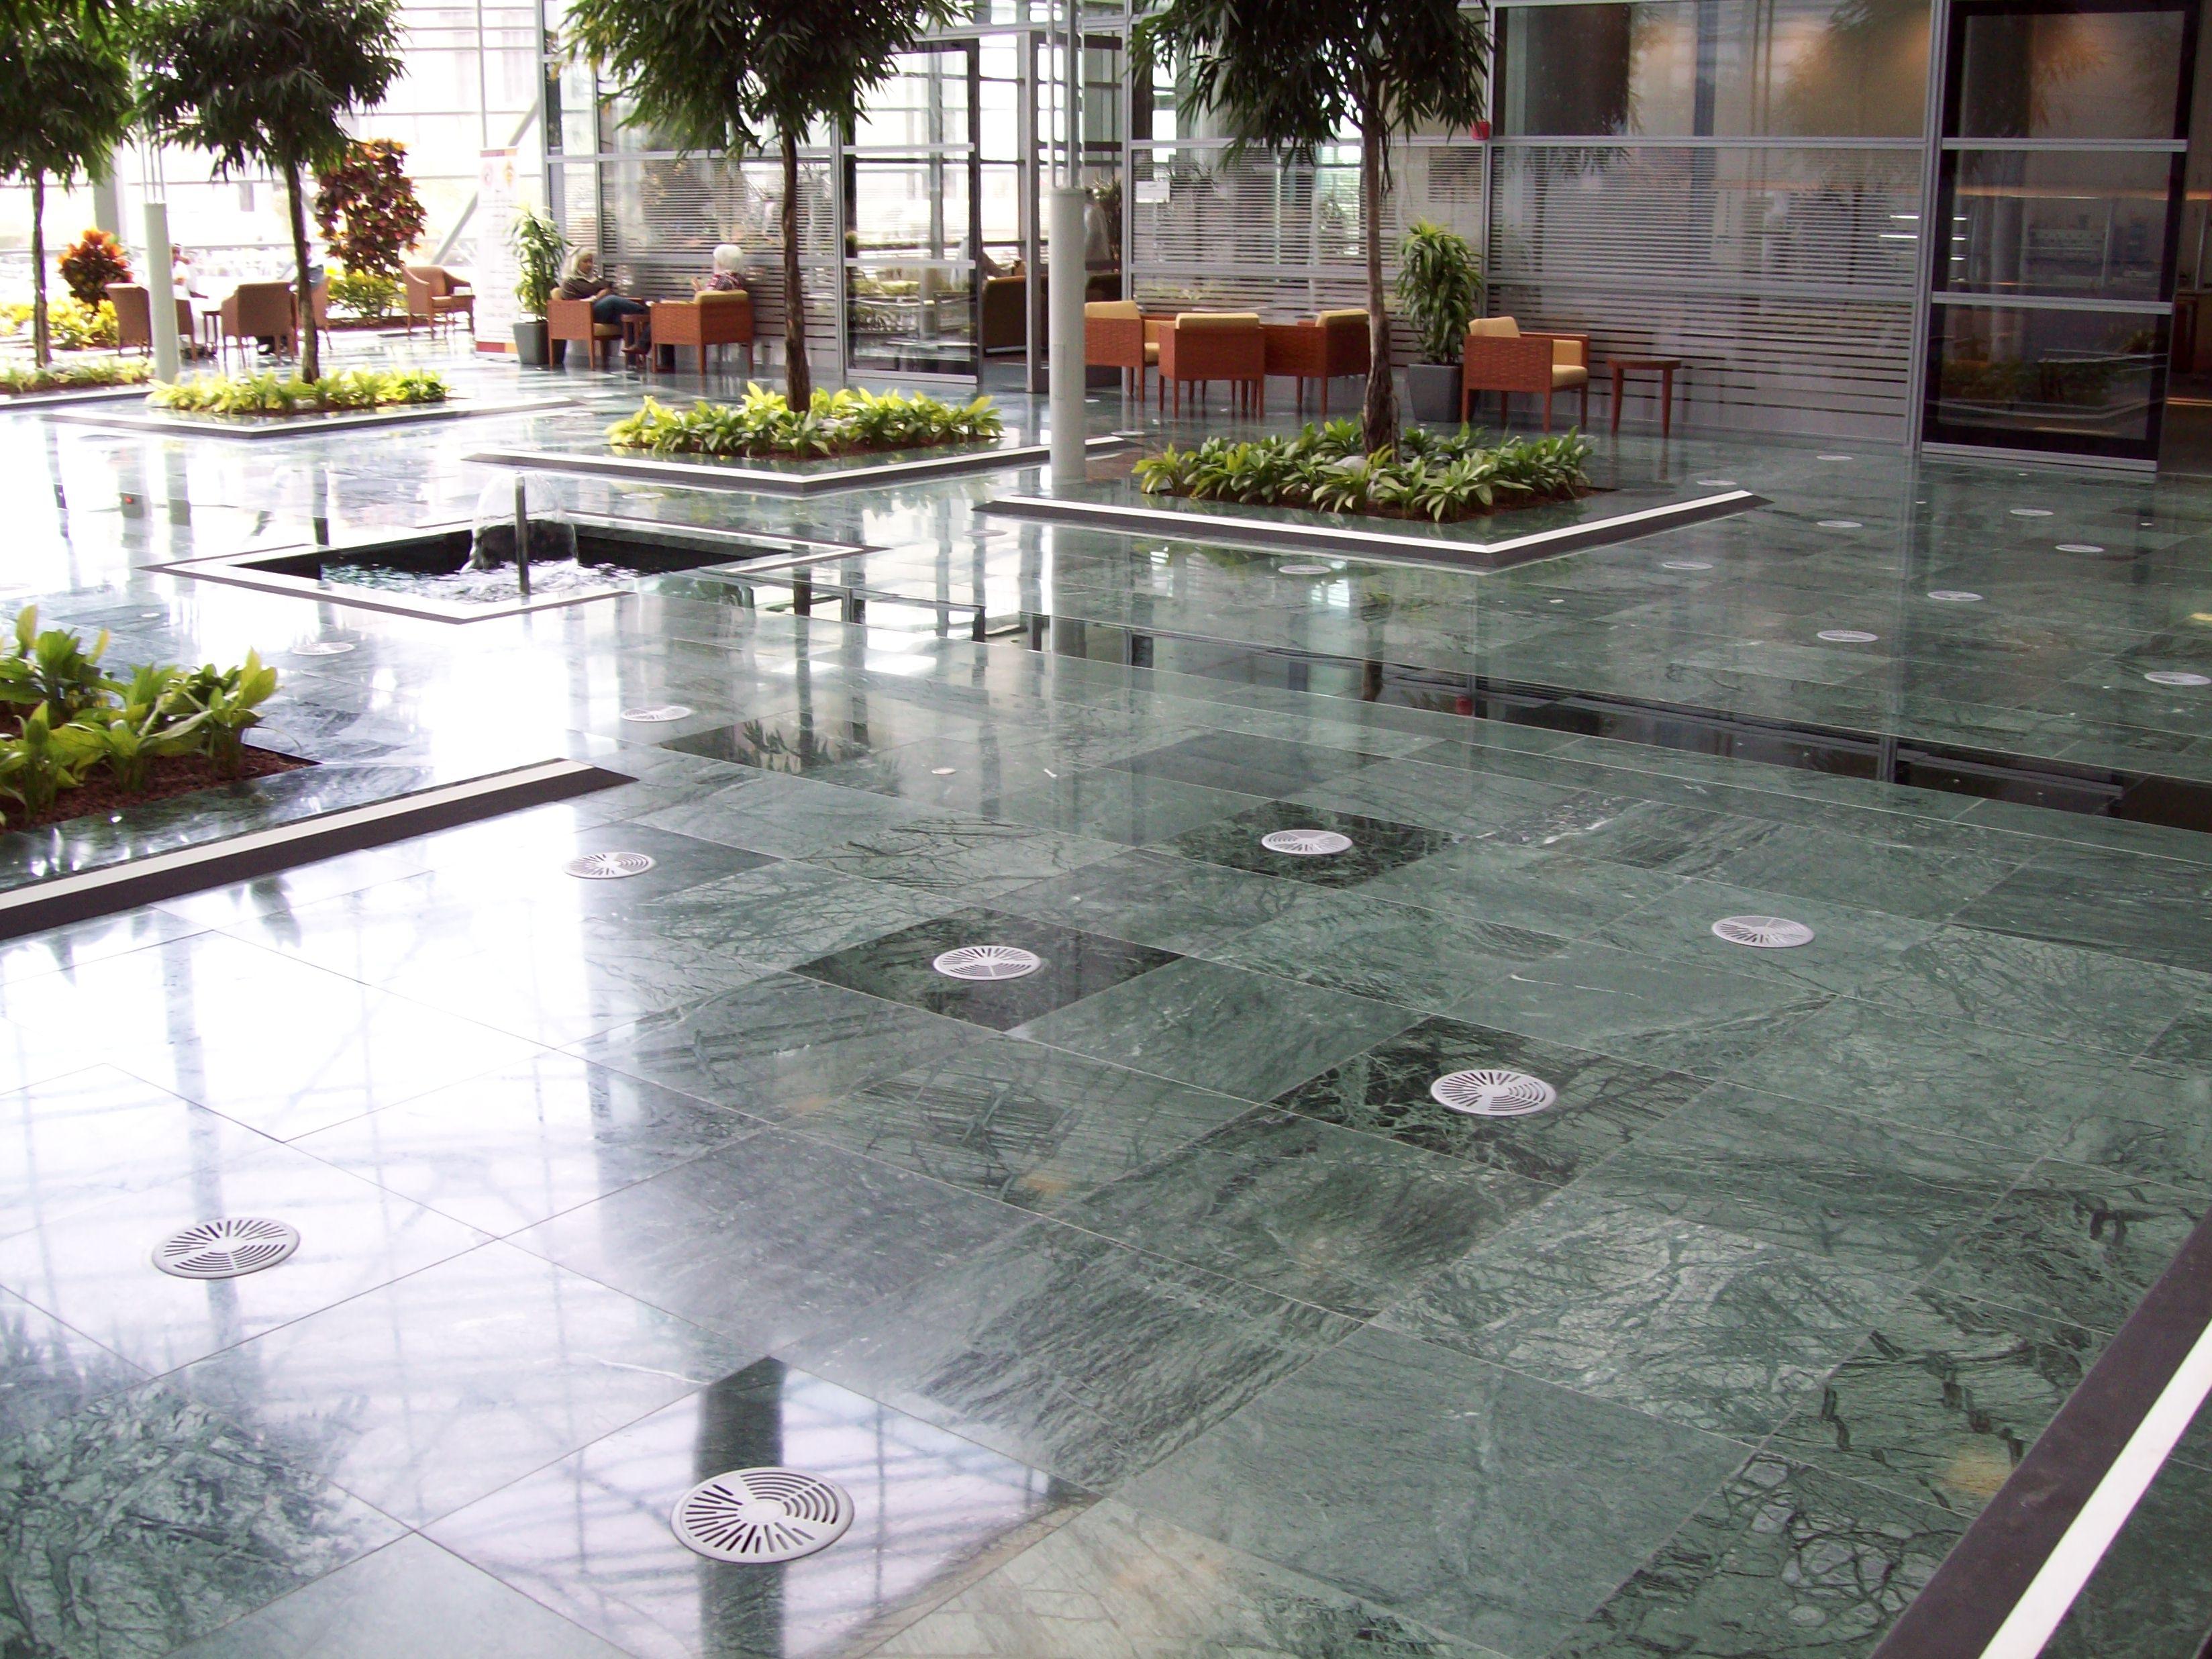 SAB MARMO 013 State Audit Bureau: pavimenti sopraelevati Nesite anche in Kuwait